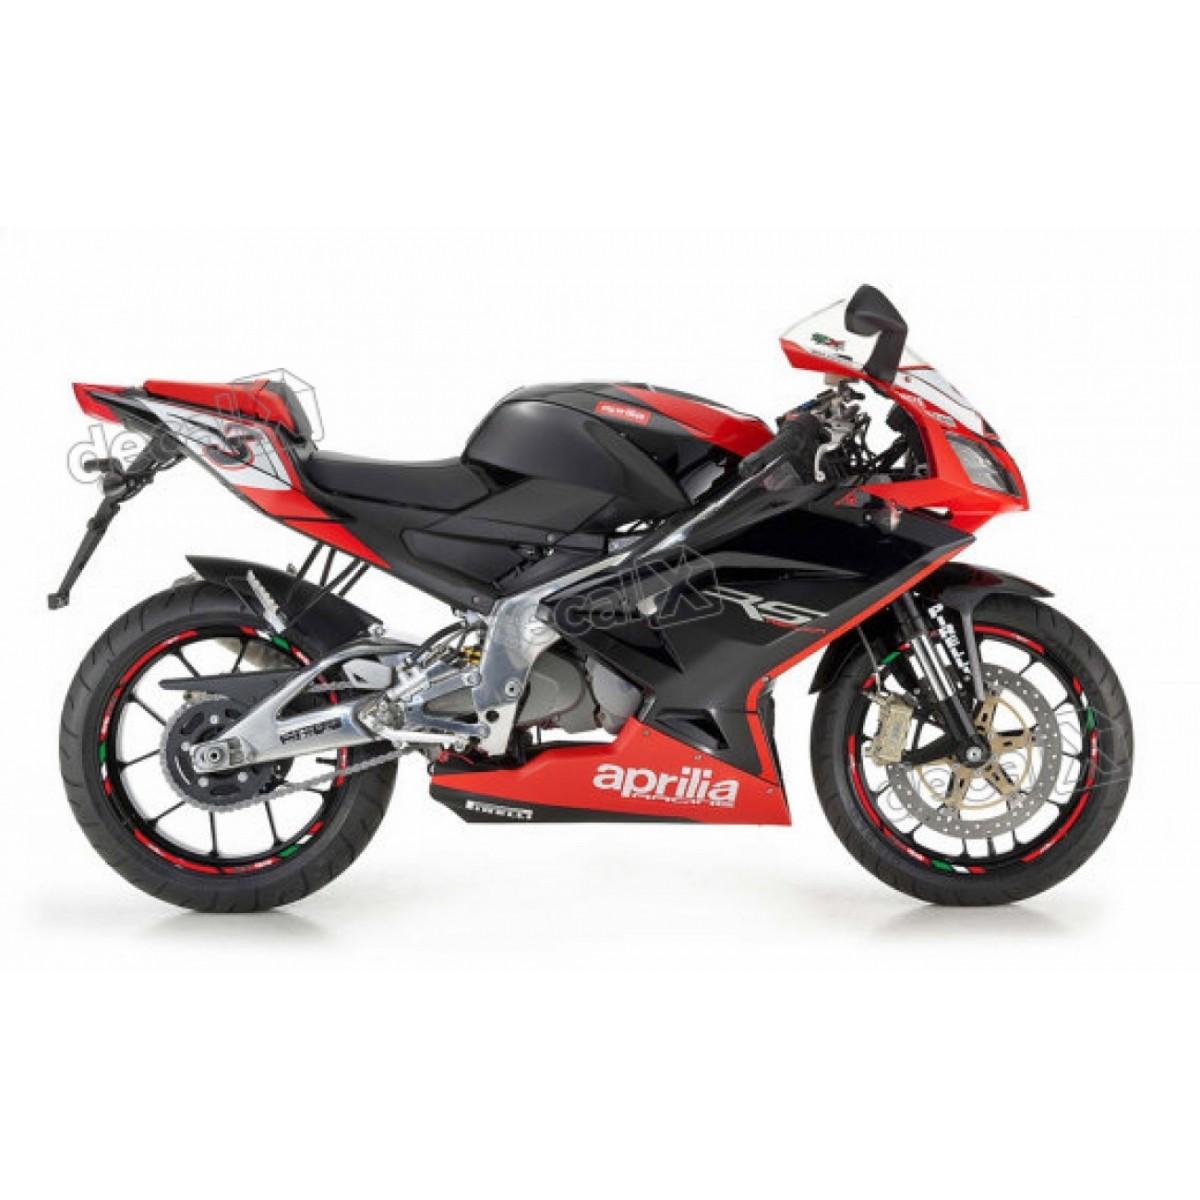 Kit Adesivo Friso Refletivo Roda Moto Aprilia Fri04 Decalx